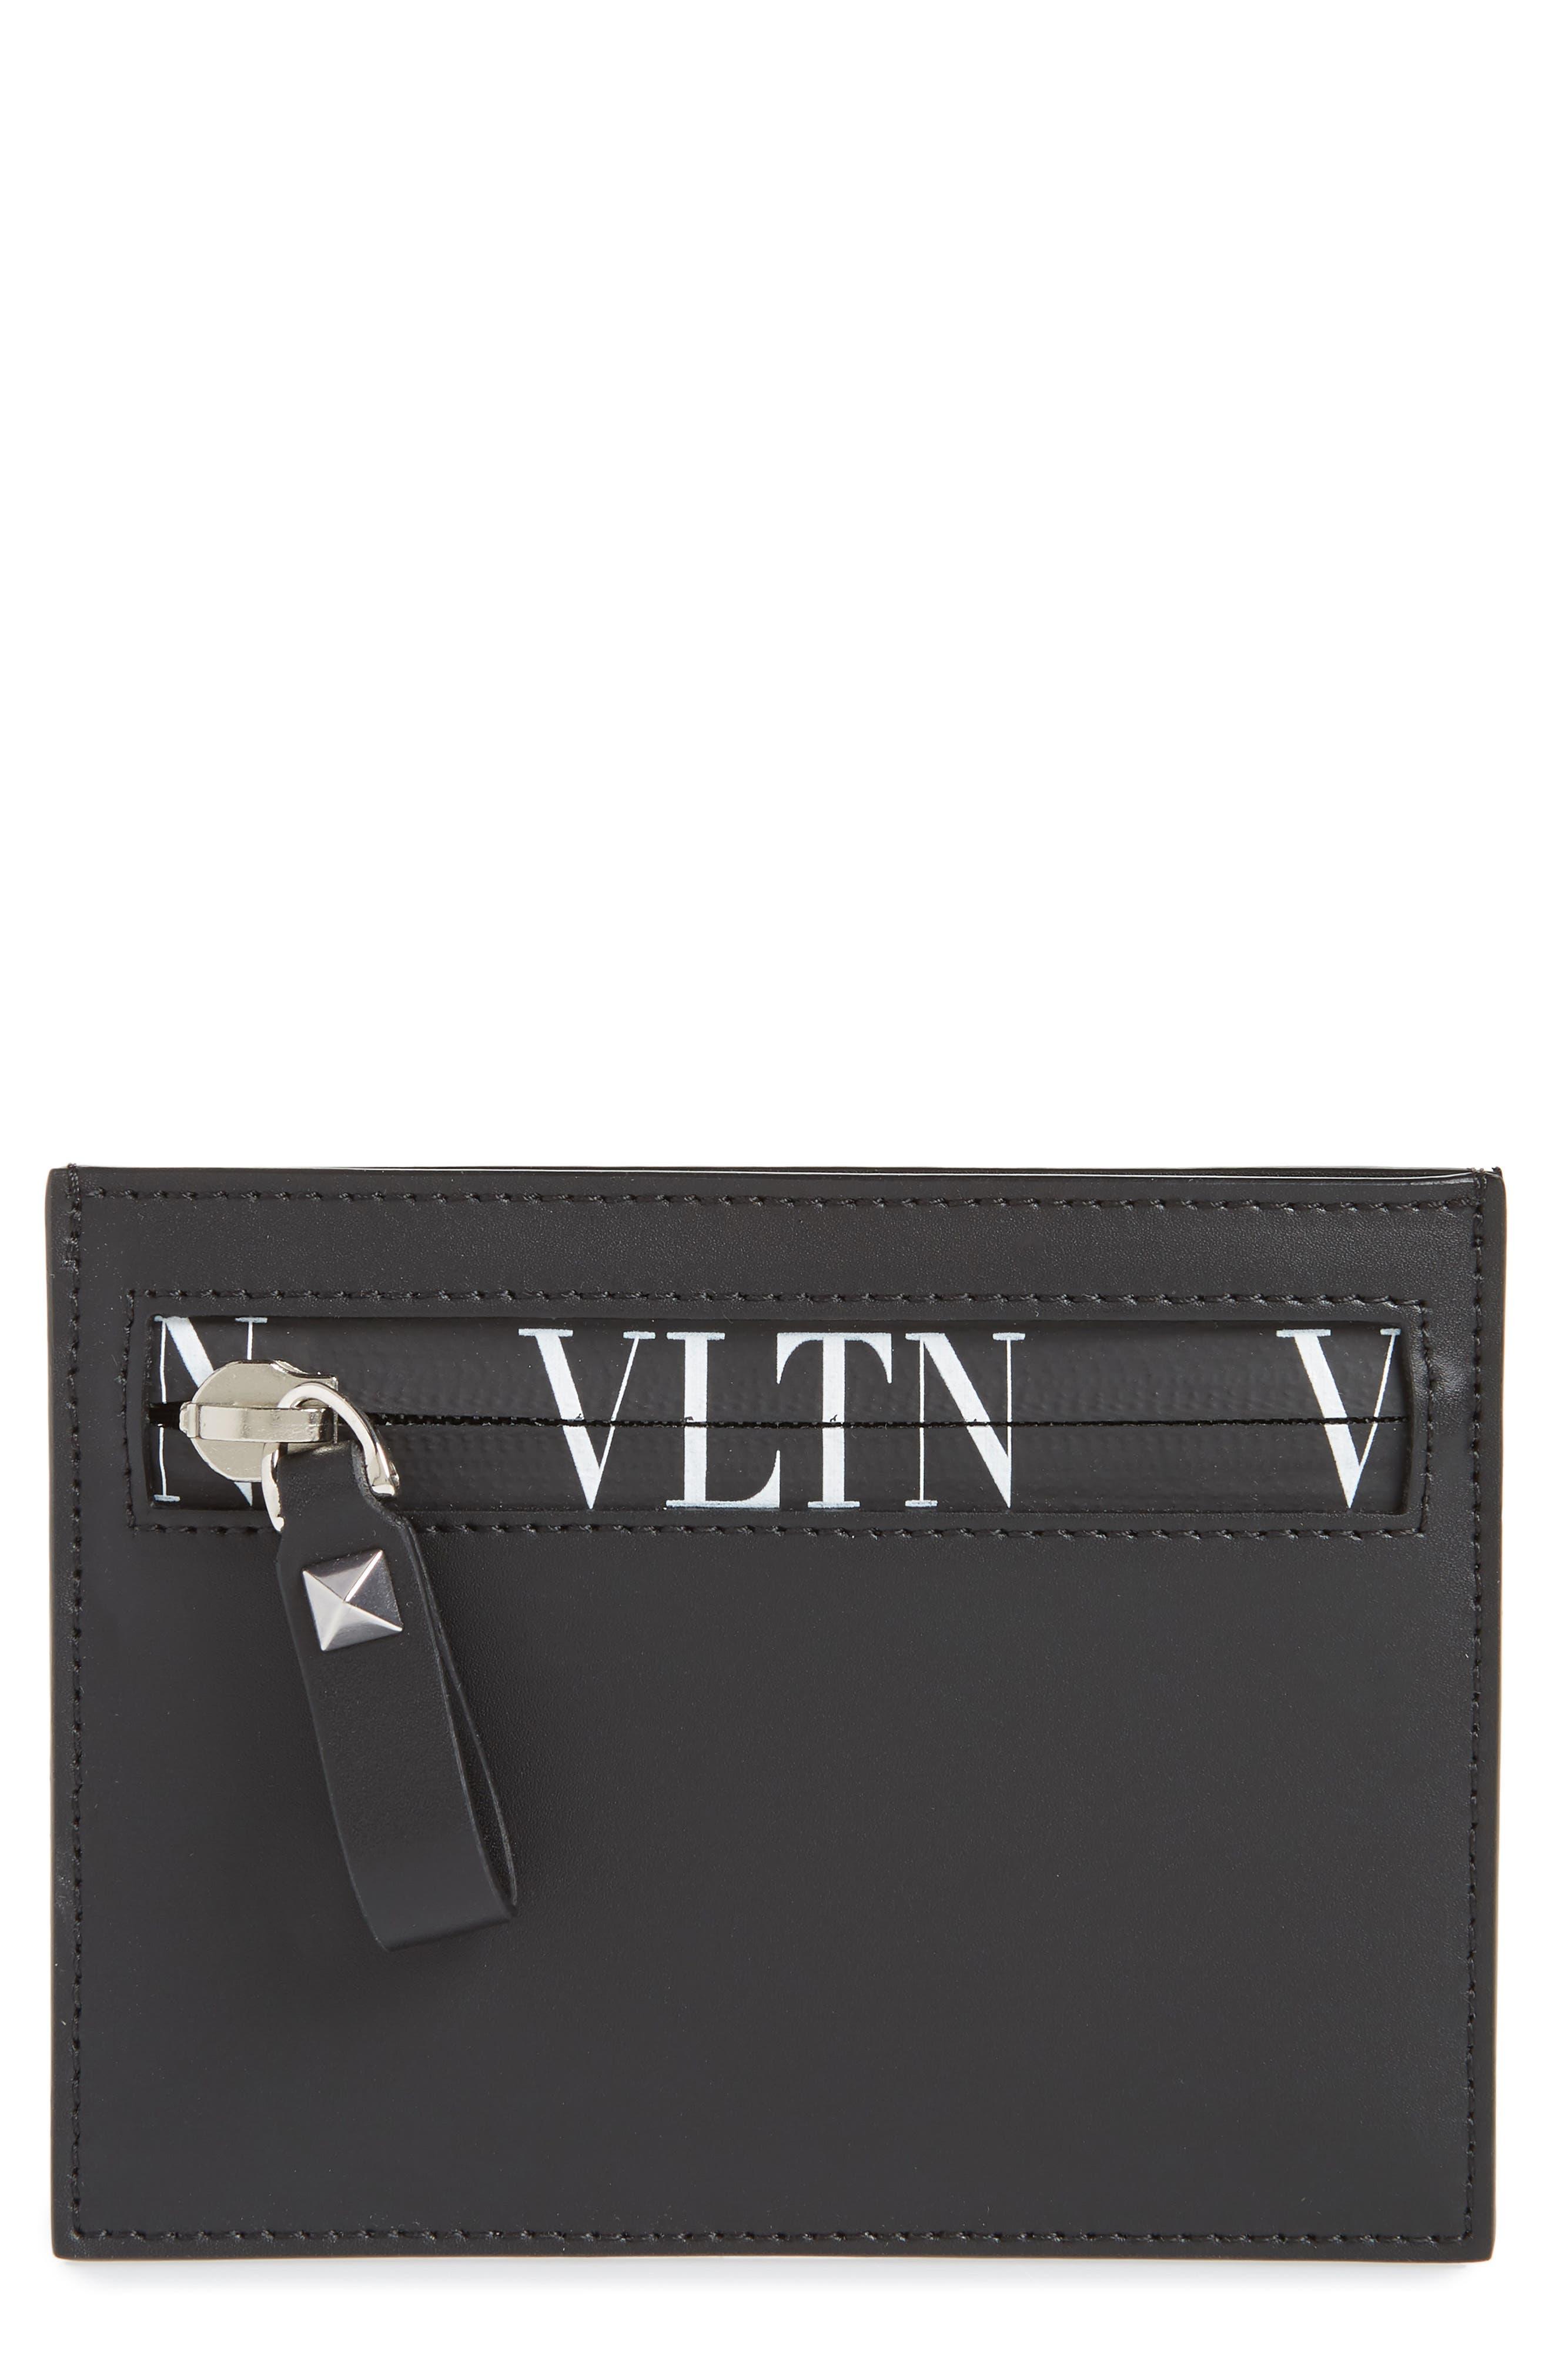 GARAVANI VLTN Logo Leather Card Case, Main, color, BLACK/ WHITE